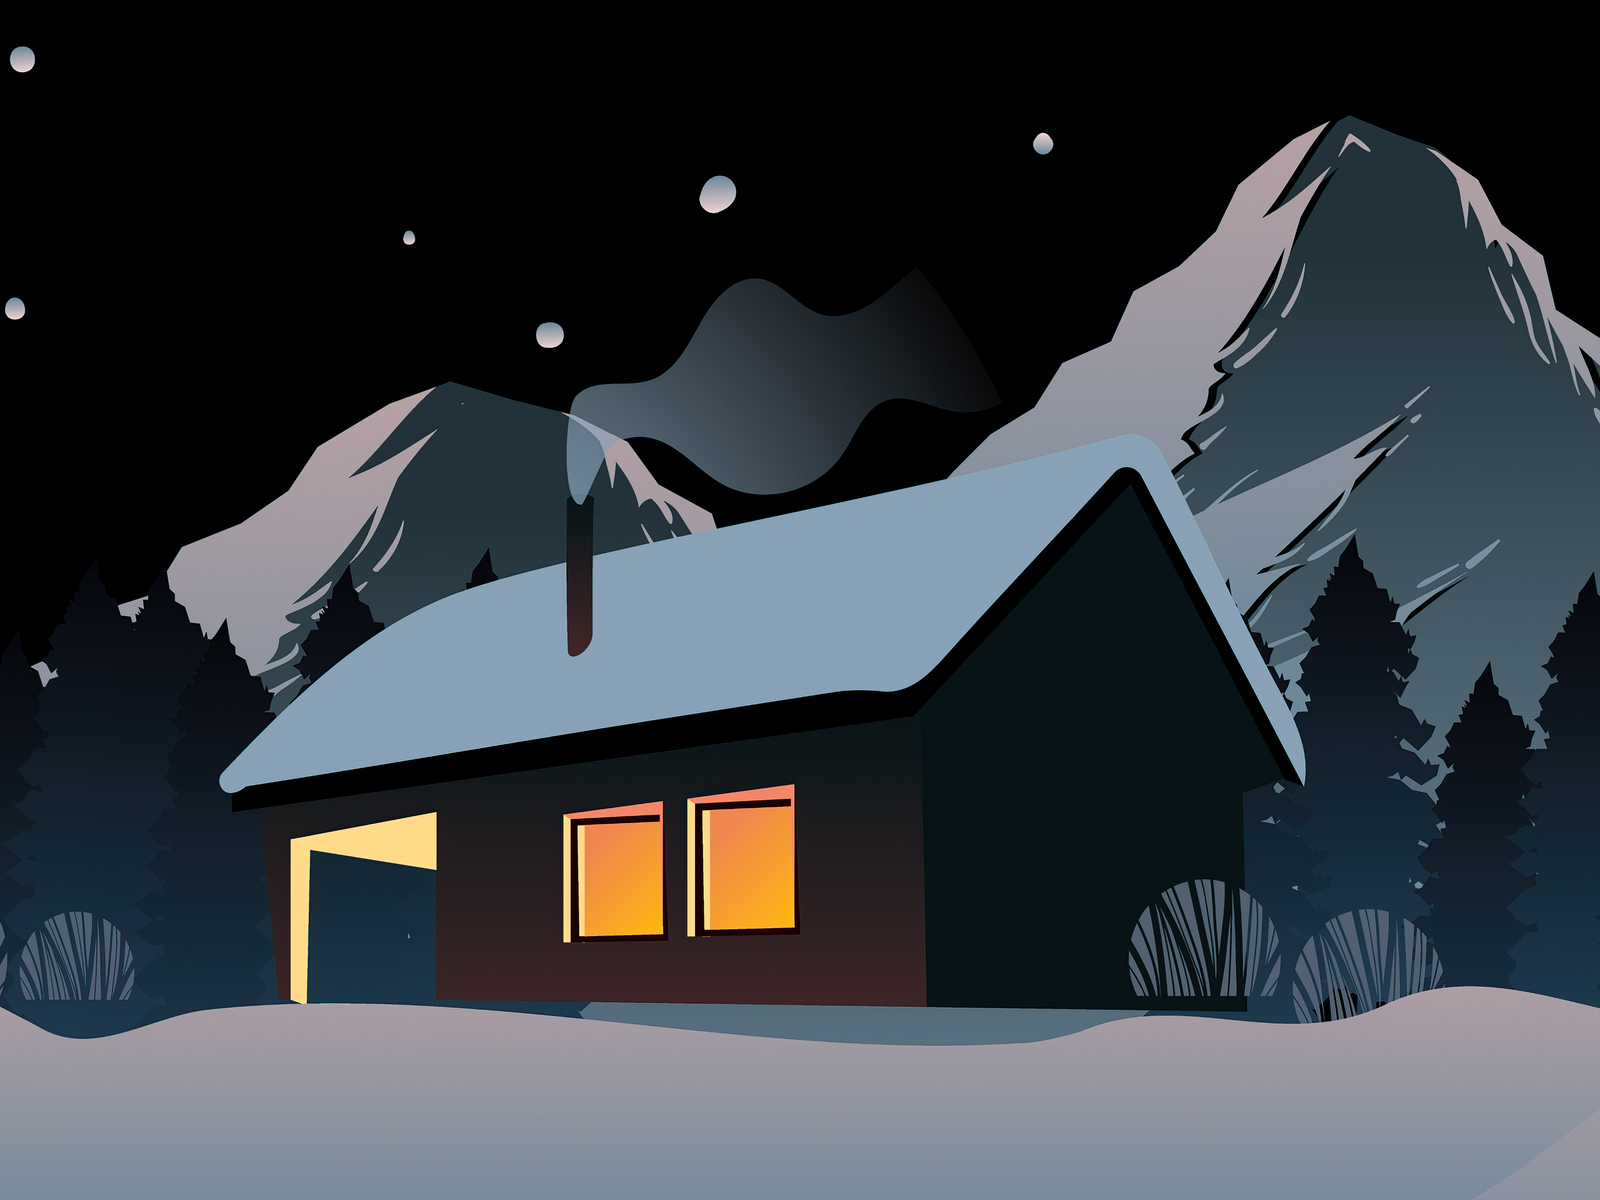 snowy-house-in-mountains-5k-x7.jpg